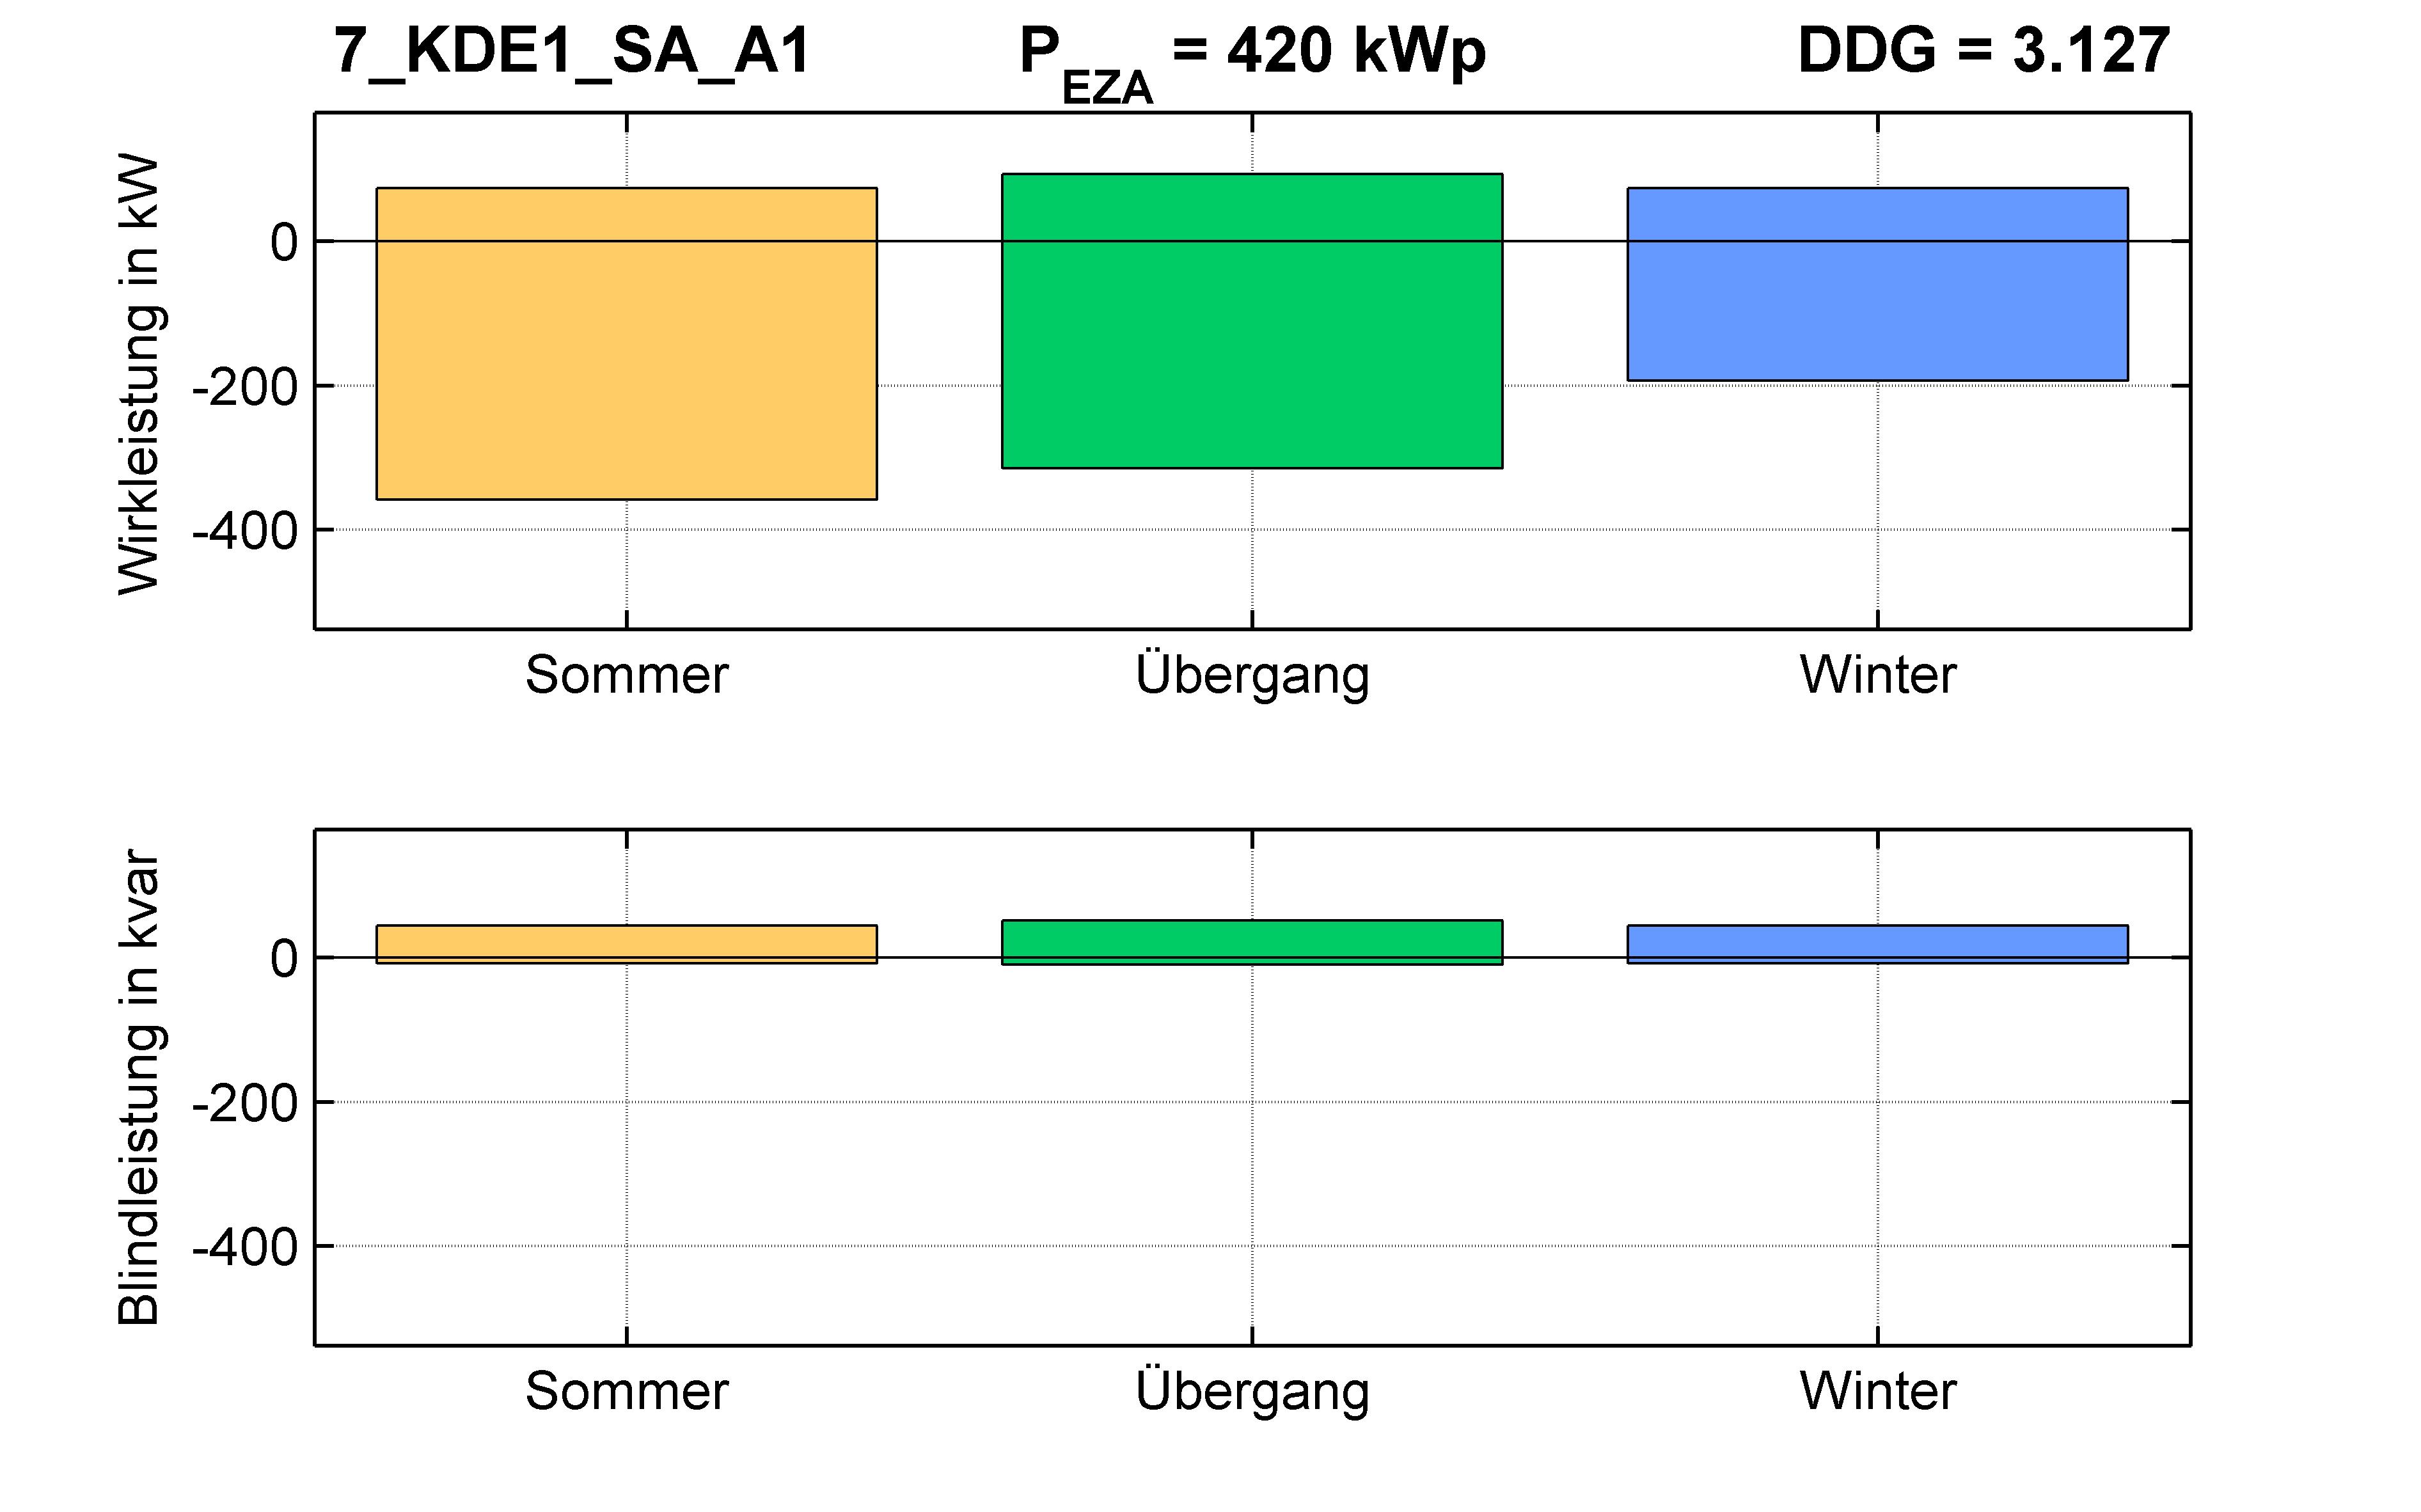 KDE1 | Längsregler (SA) A1 | PQ-Bilanz